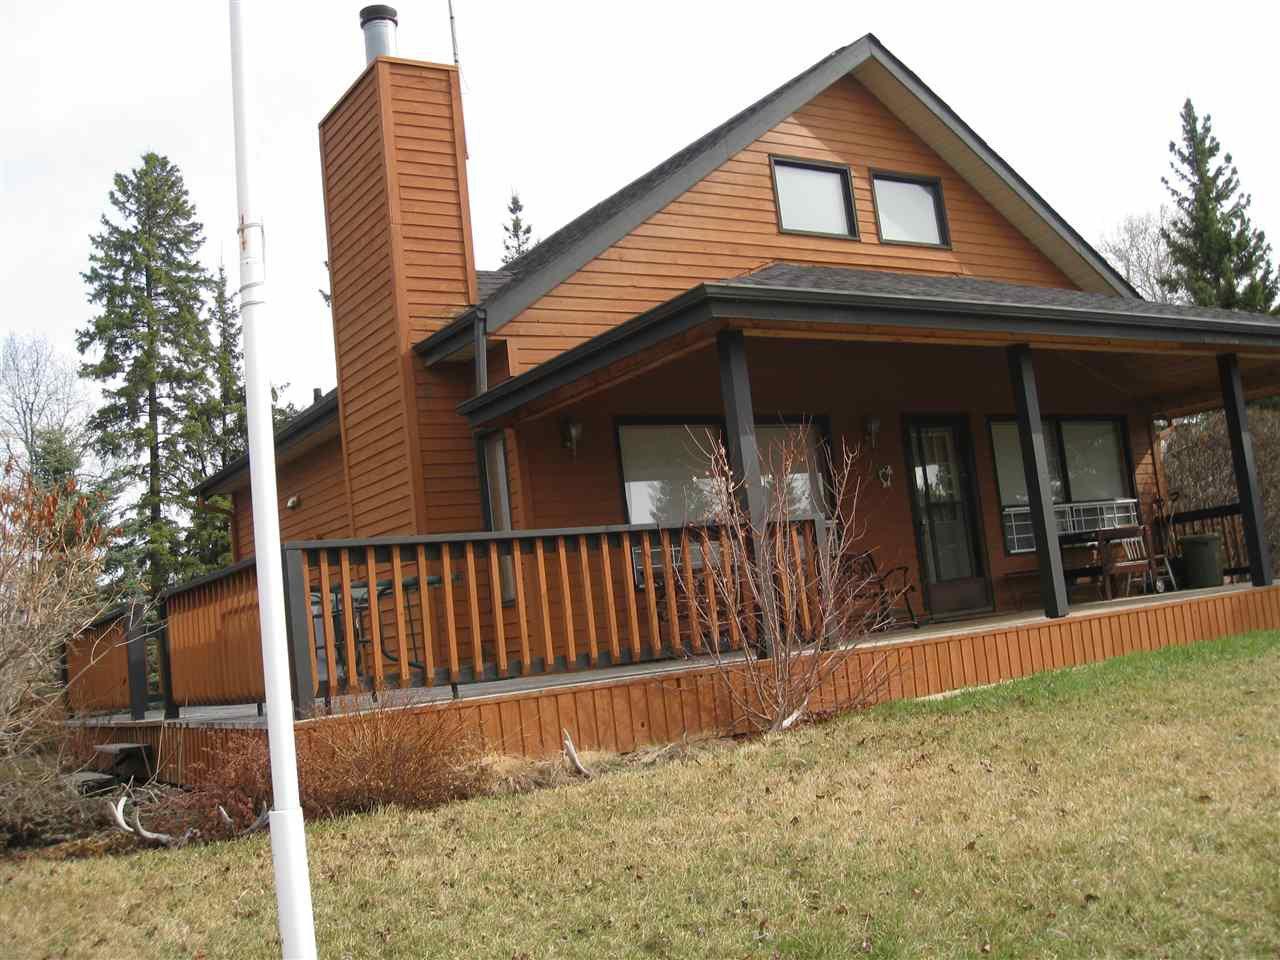 Main Photo: 47 54126 Rge Rd 52: Rural Lac Ste. Anne County House for sale : MLS®# E4108375